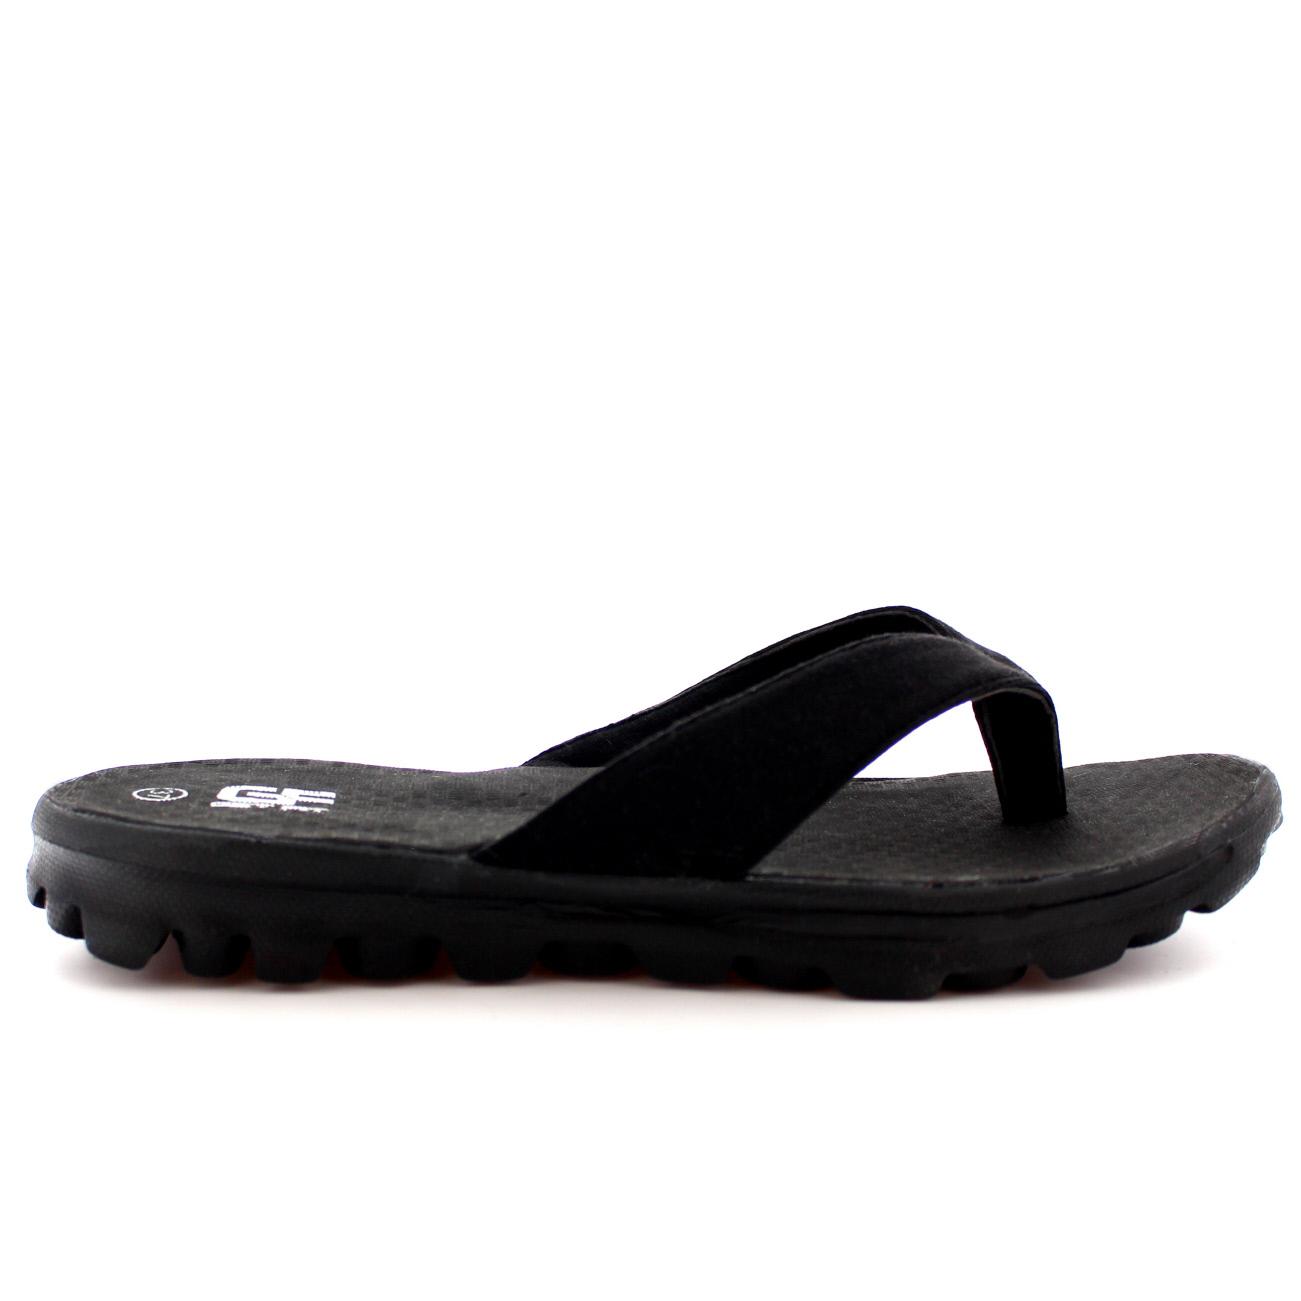 7f857e1a4144e0 Buy mens sports flip flops cheap